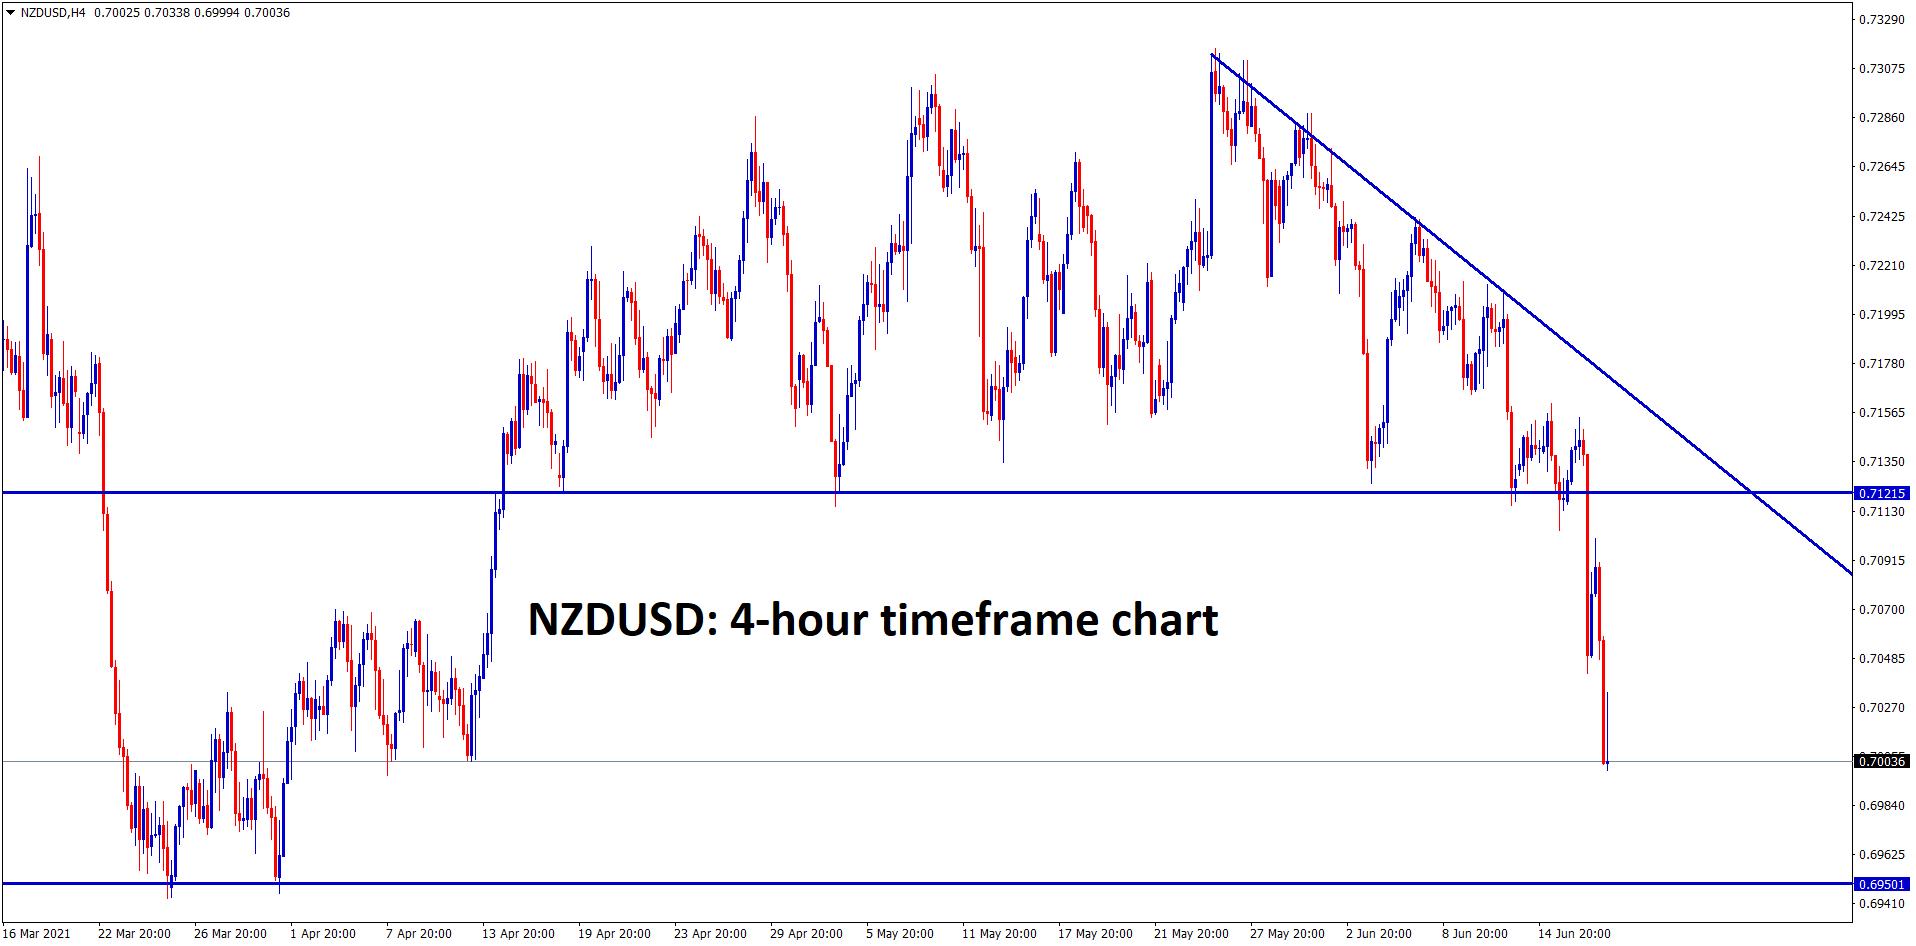 NZDUSD has broken the bottom level of the Descending Triangle pattern